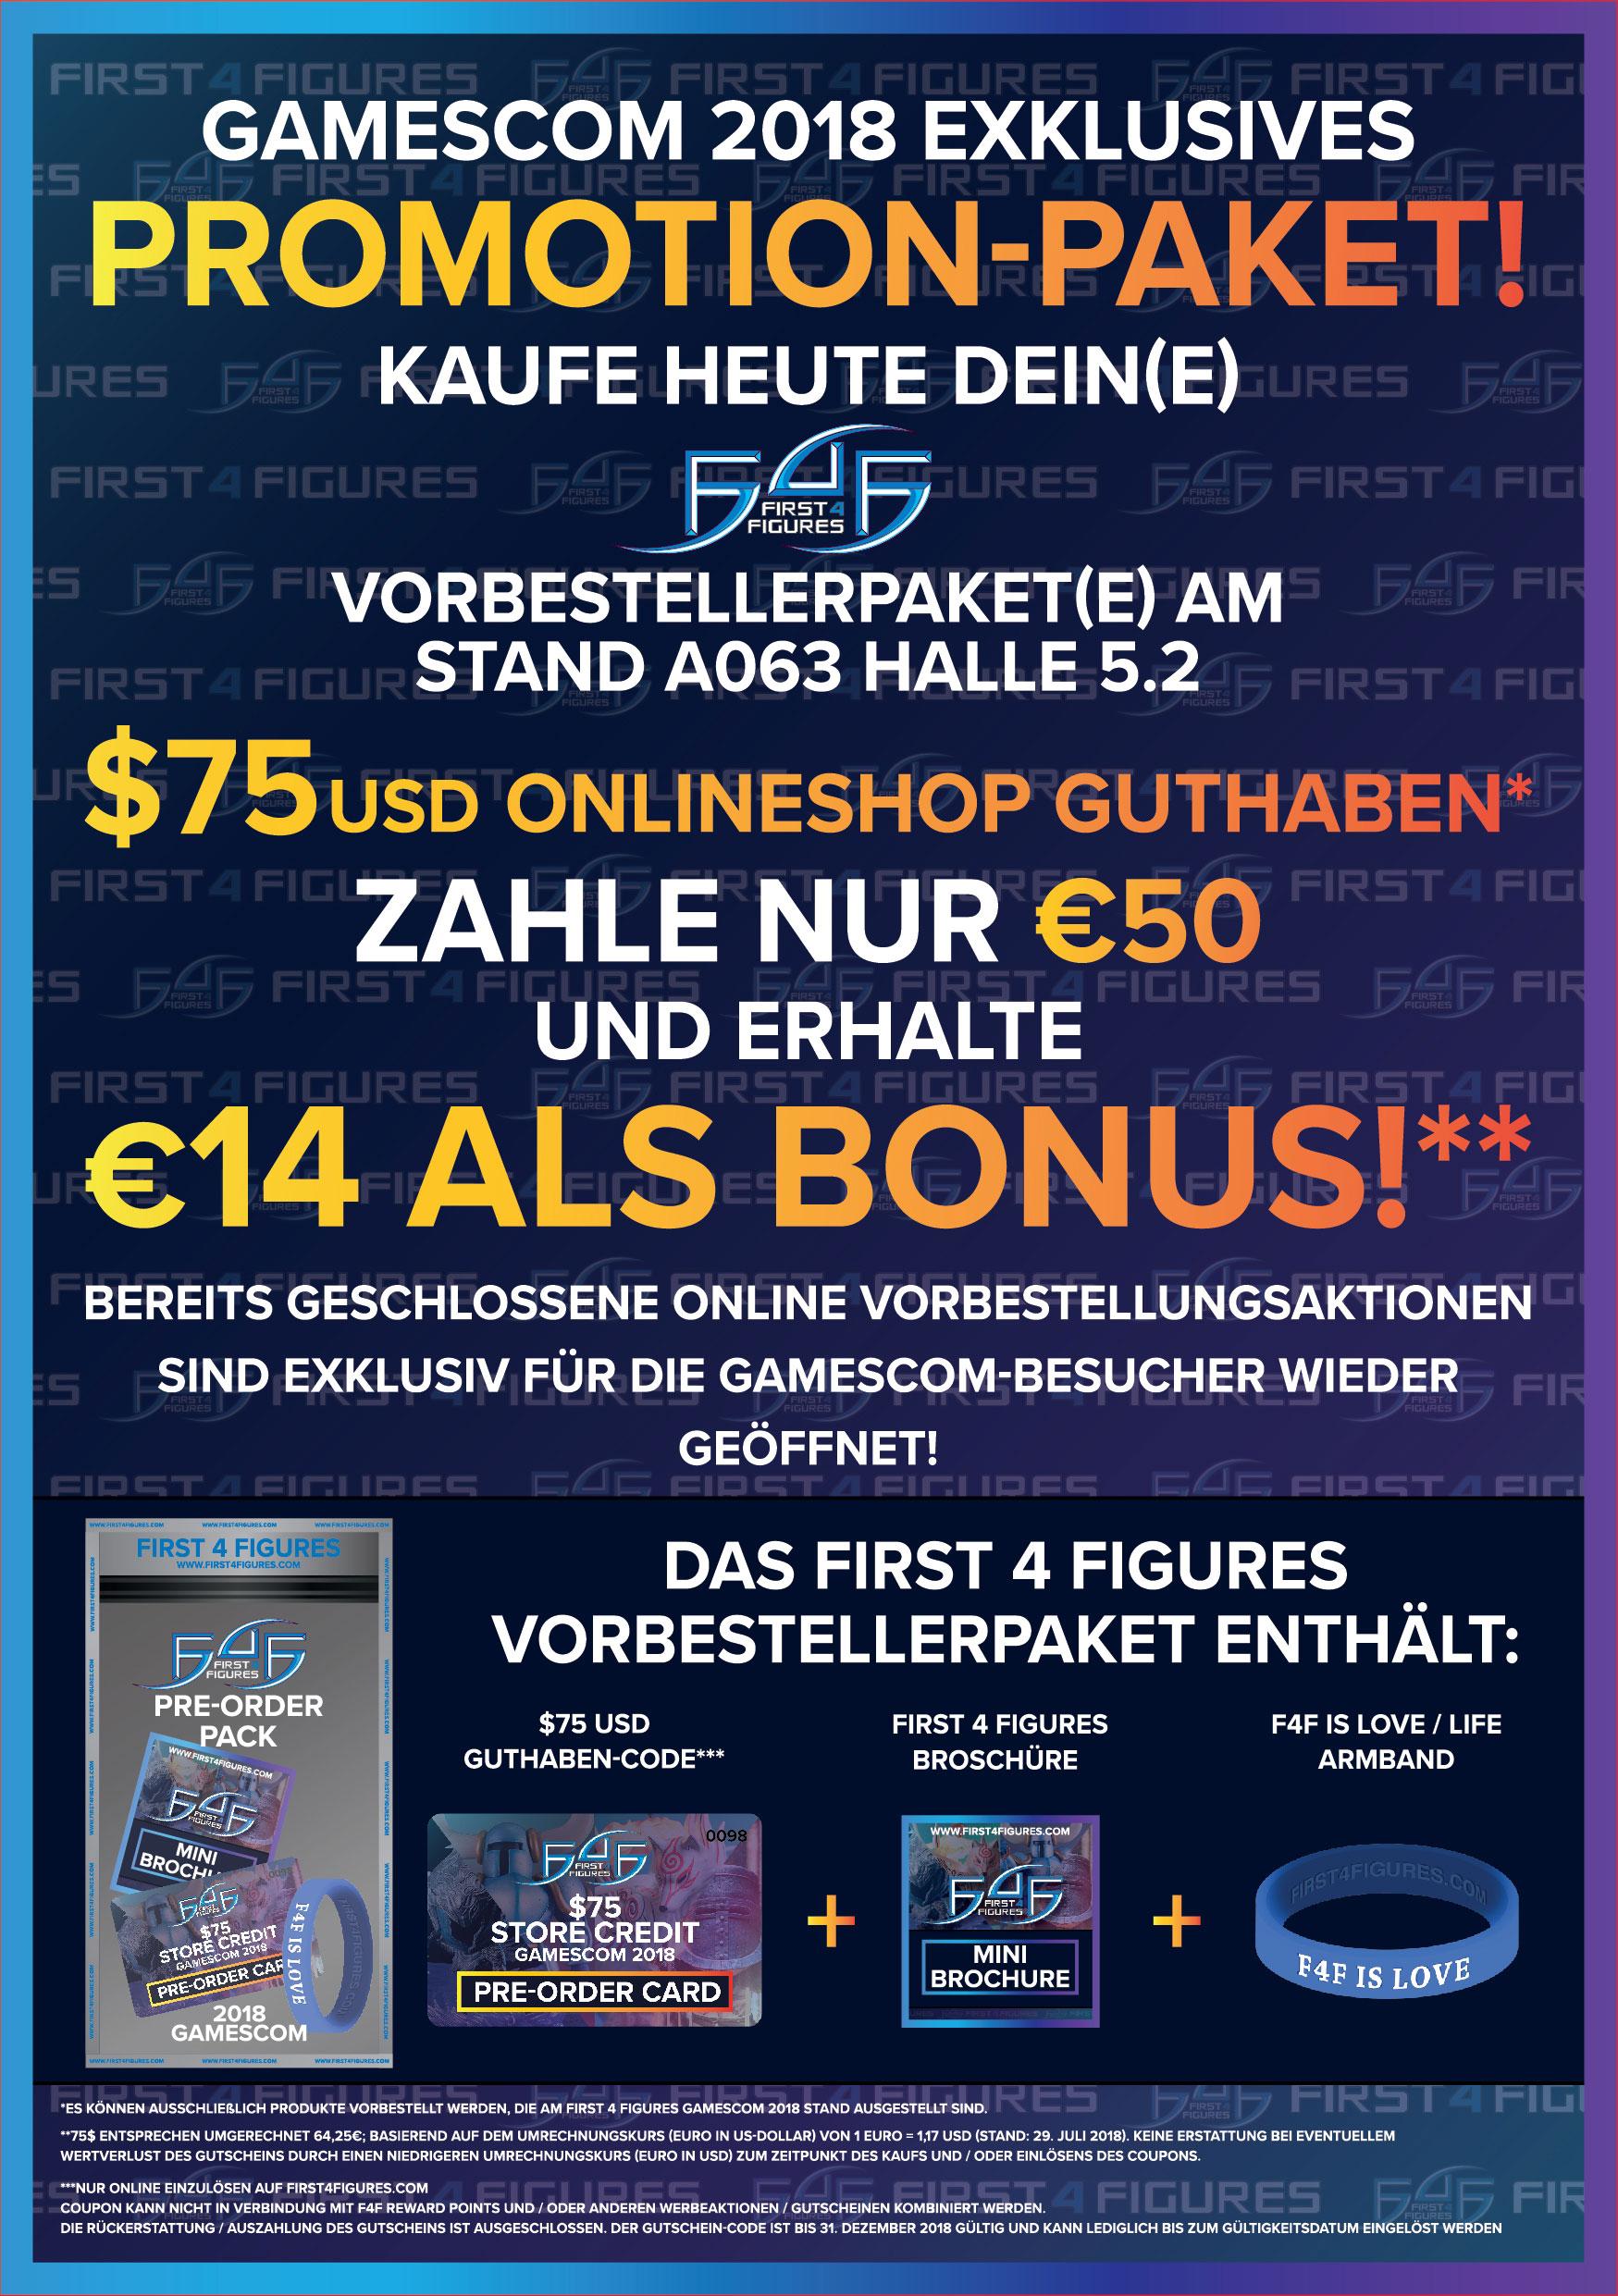 Gamescom 2018 F4F flyer (German)